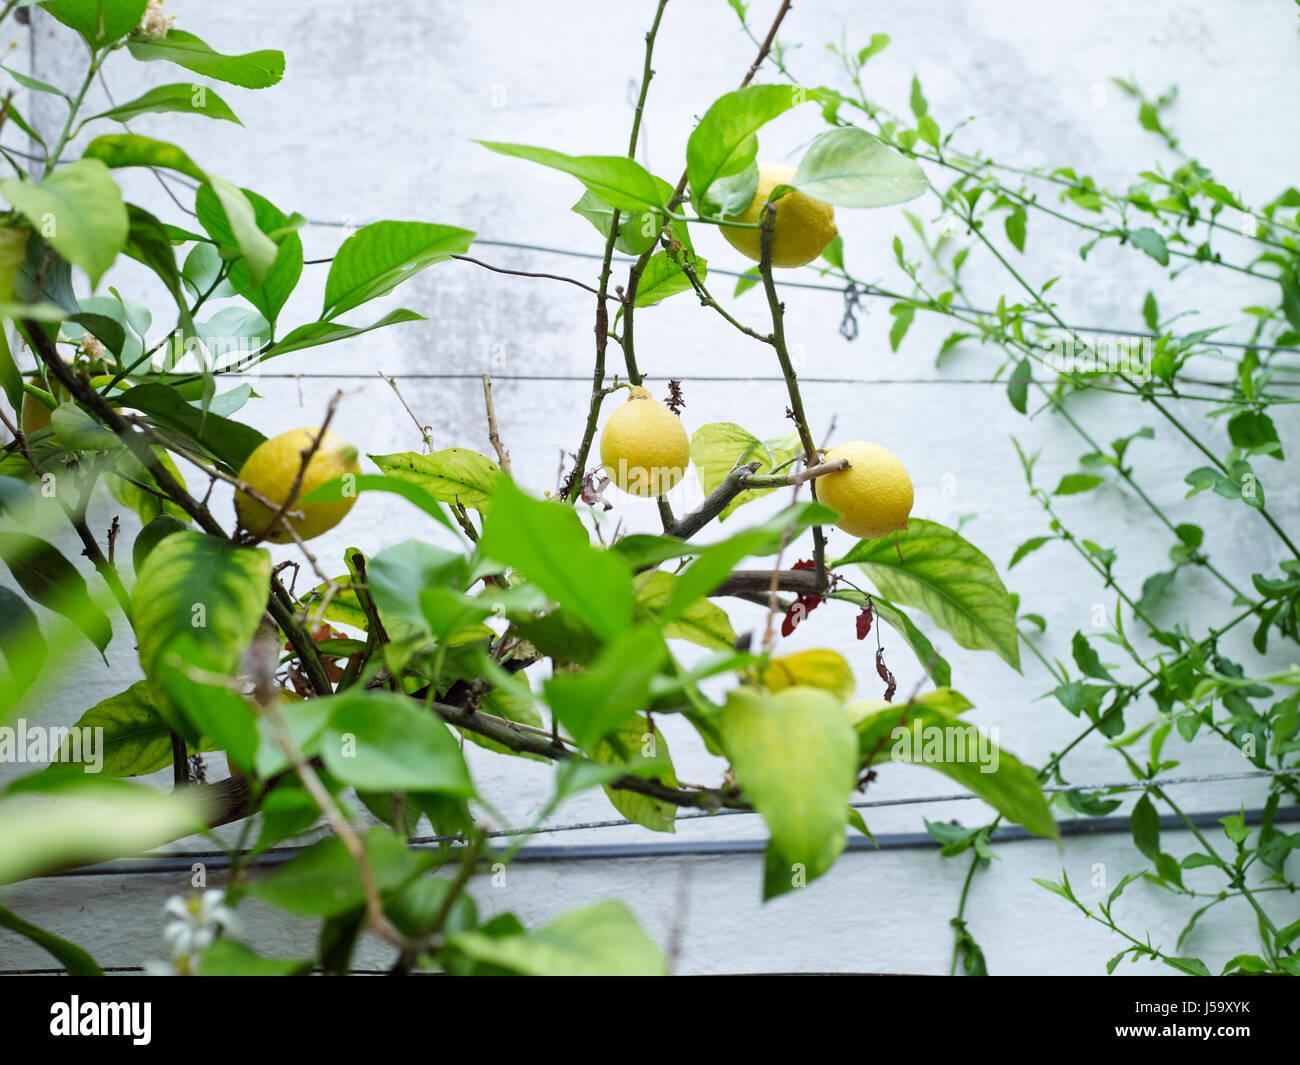 Like topic fruits basket lemon threesome